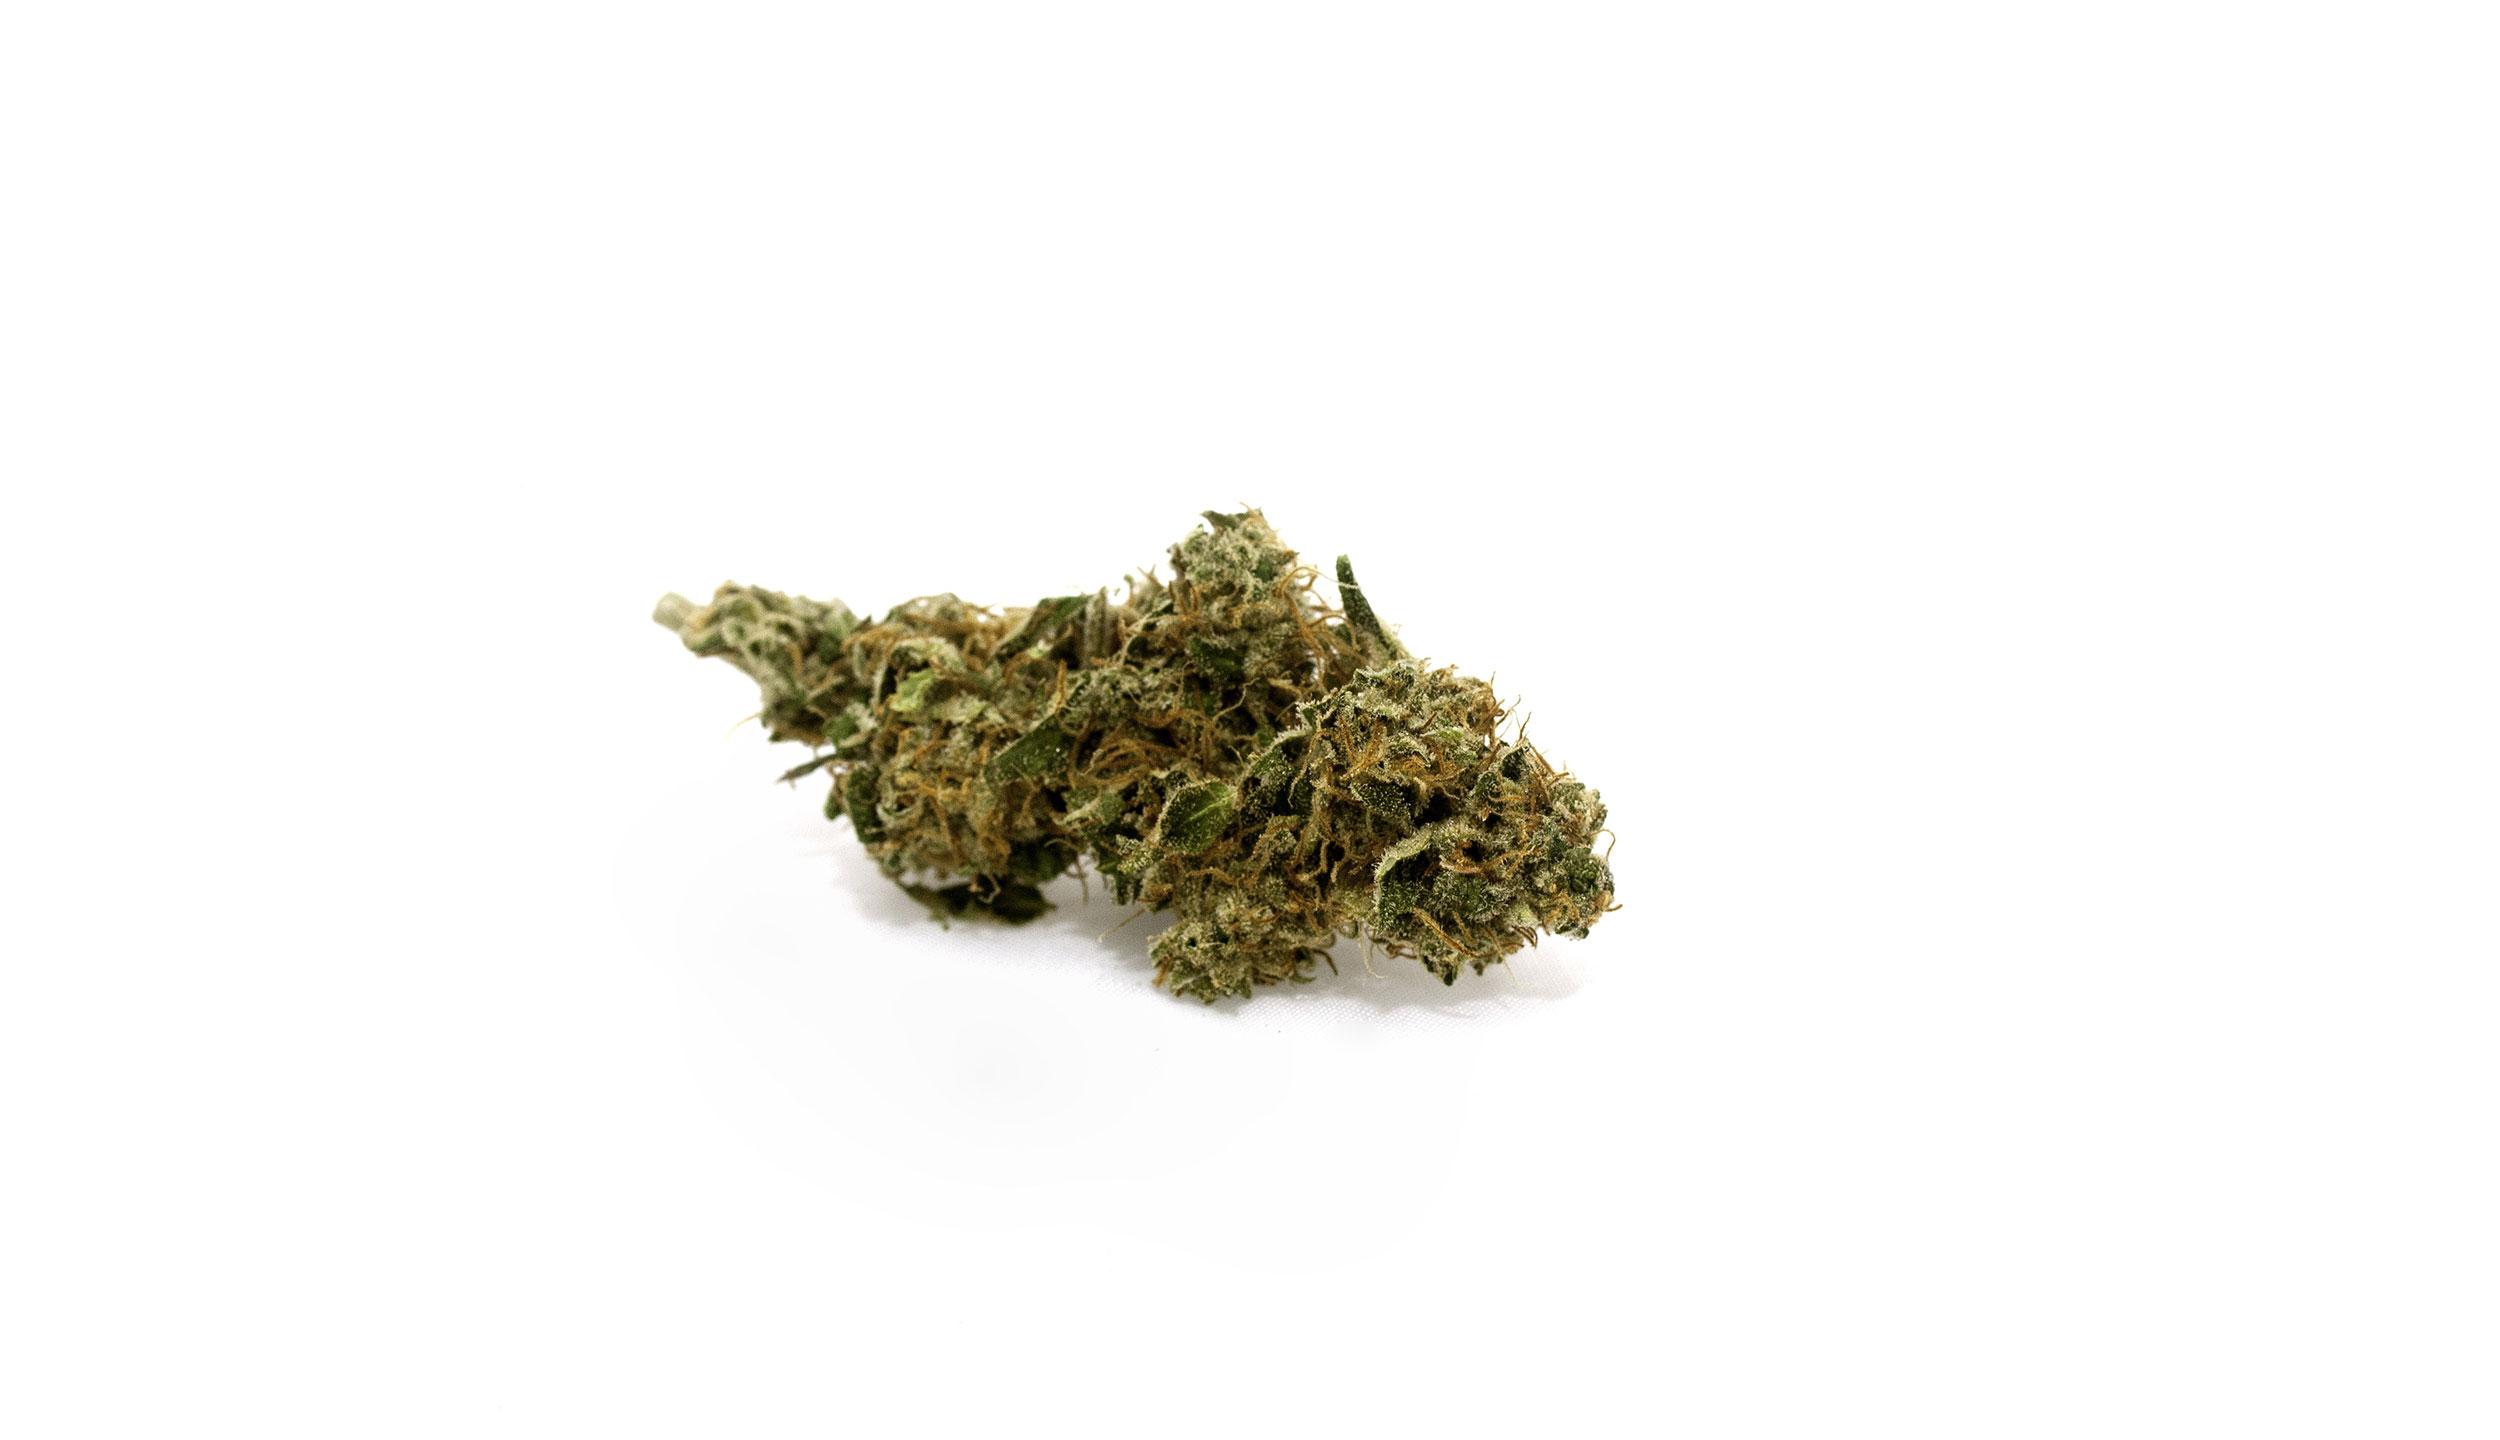 Untersuchung: Cannabis als Medizin